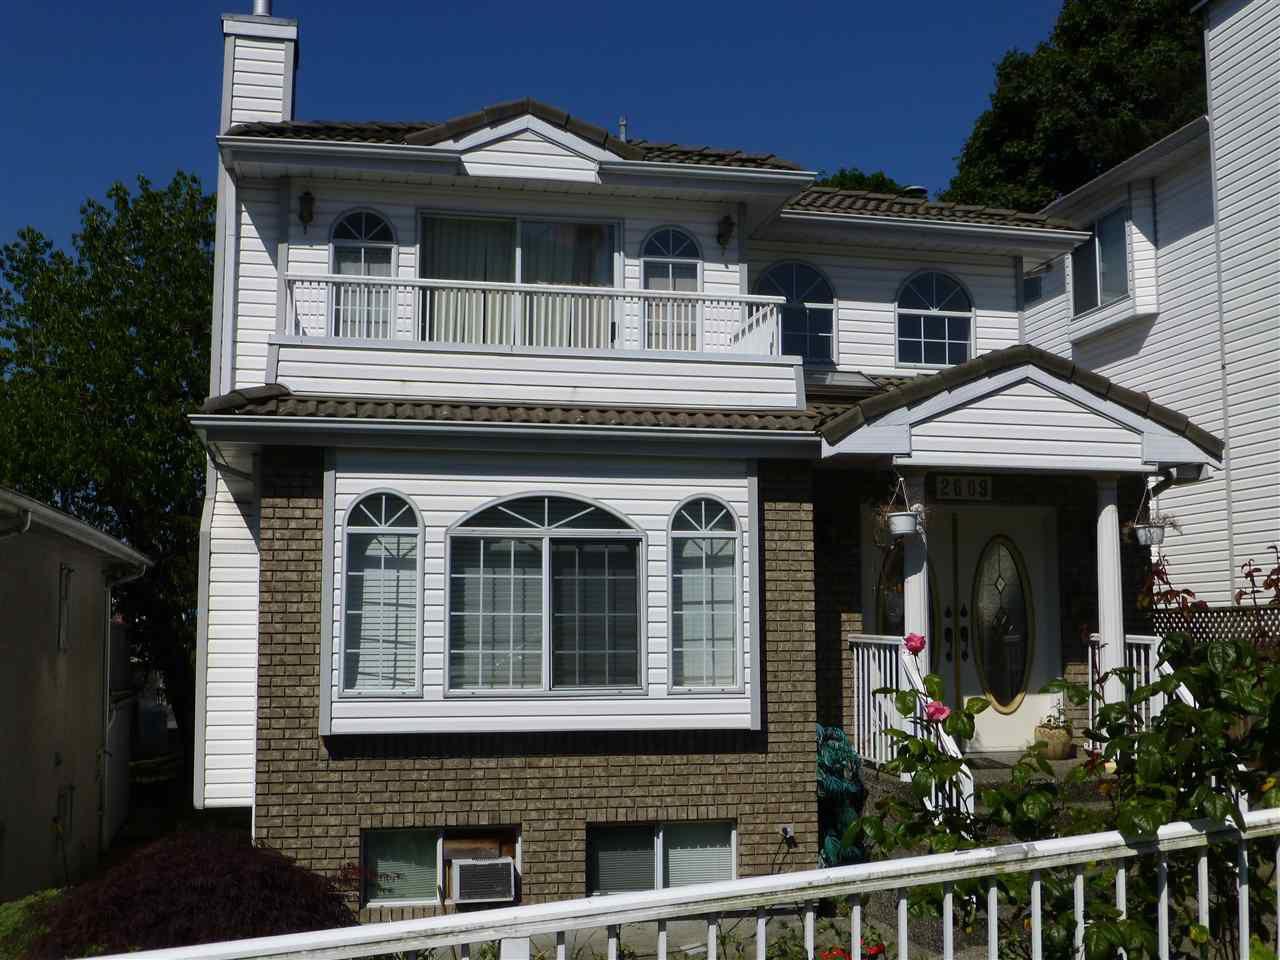 Main Photo: 2609 RENFREW Street in Vancouver: Renfrew VE House for sale (Vancouver East)  : MLS®# R2067595